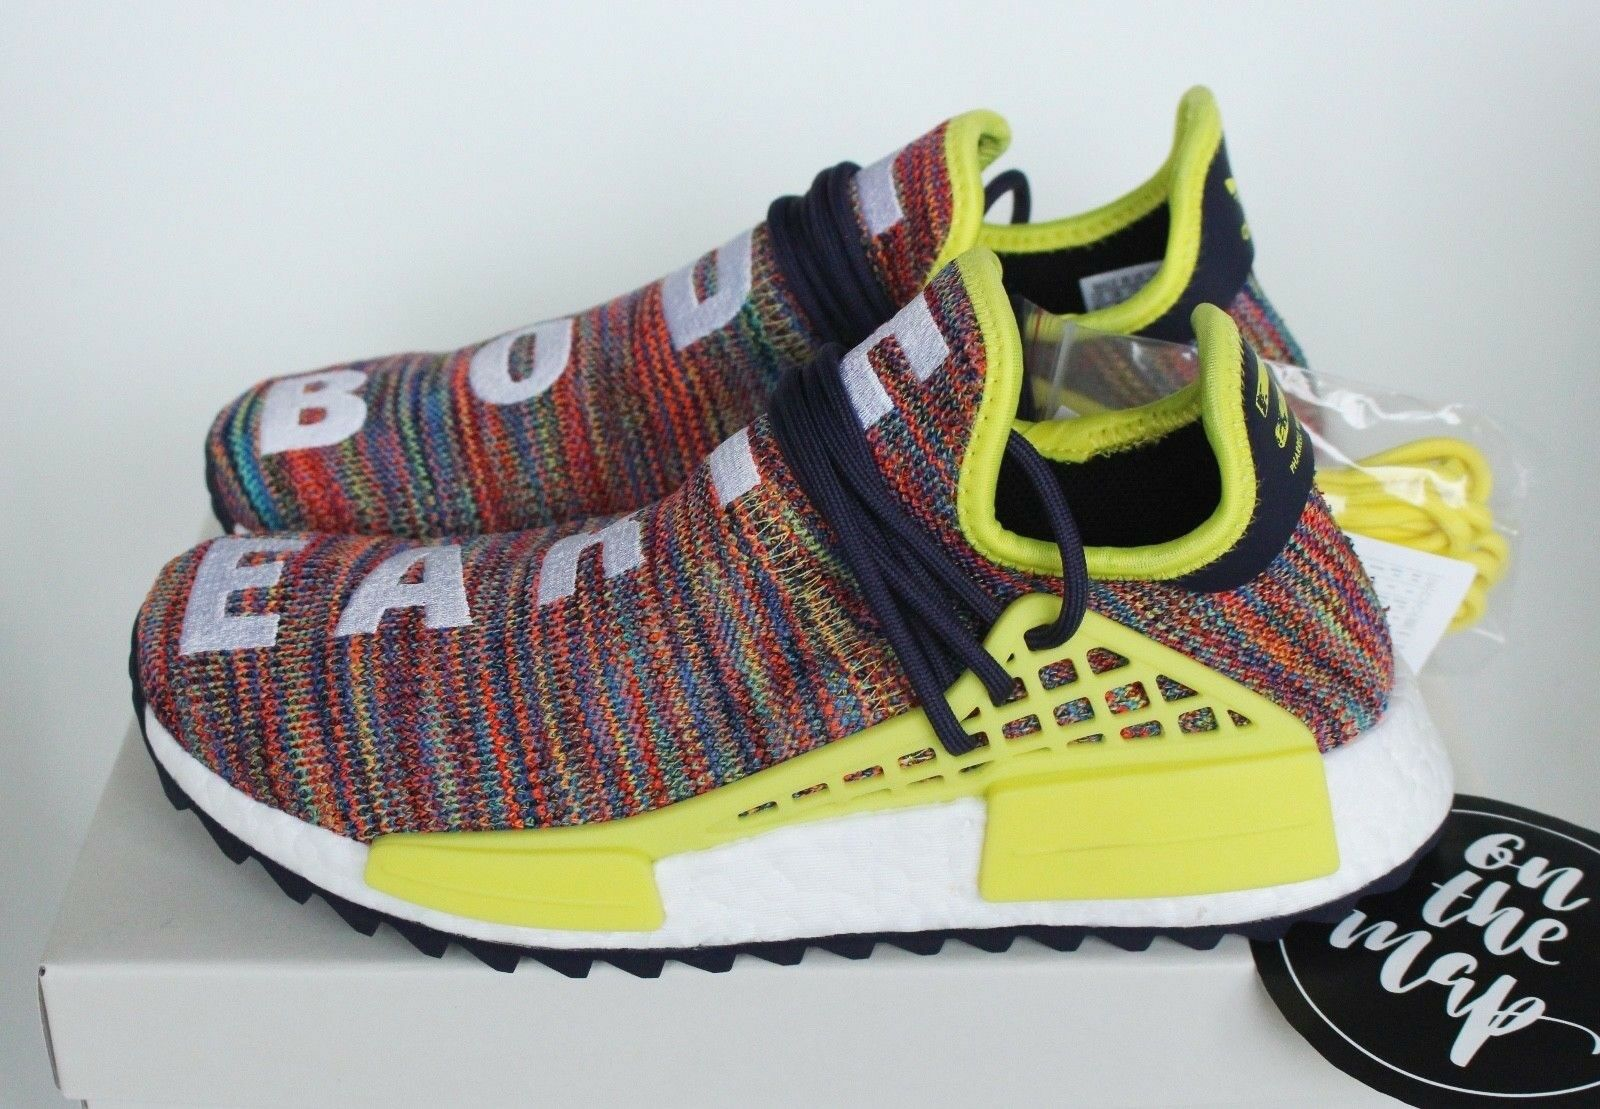 Adidas Pharrell Human Race HU NMD Trail Multi Ink Yellow 5 6 7 8 9 10 11 12 New